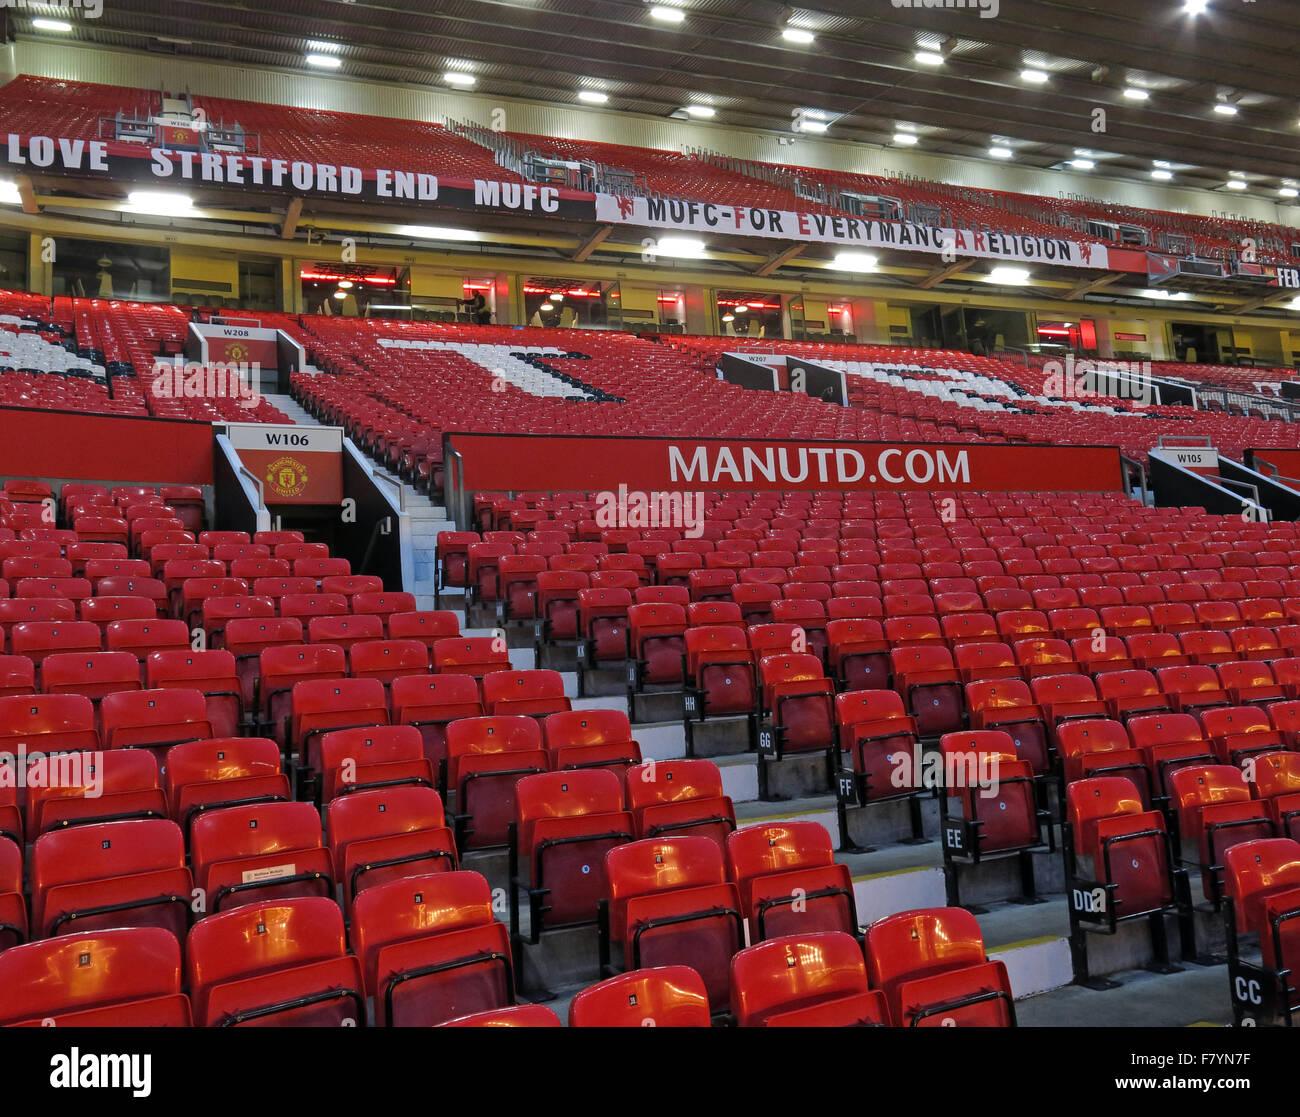 Laden Sie dieses Alamy Stockfoto Manchester United Stretford End, Old Trafford Stadion, MUFC, England, UK - F7YN7F